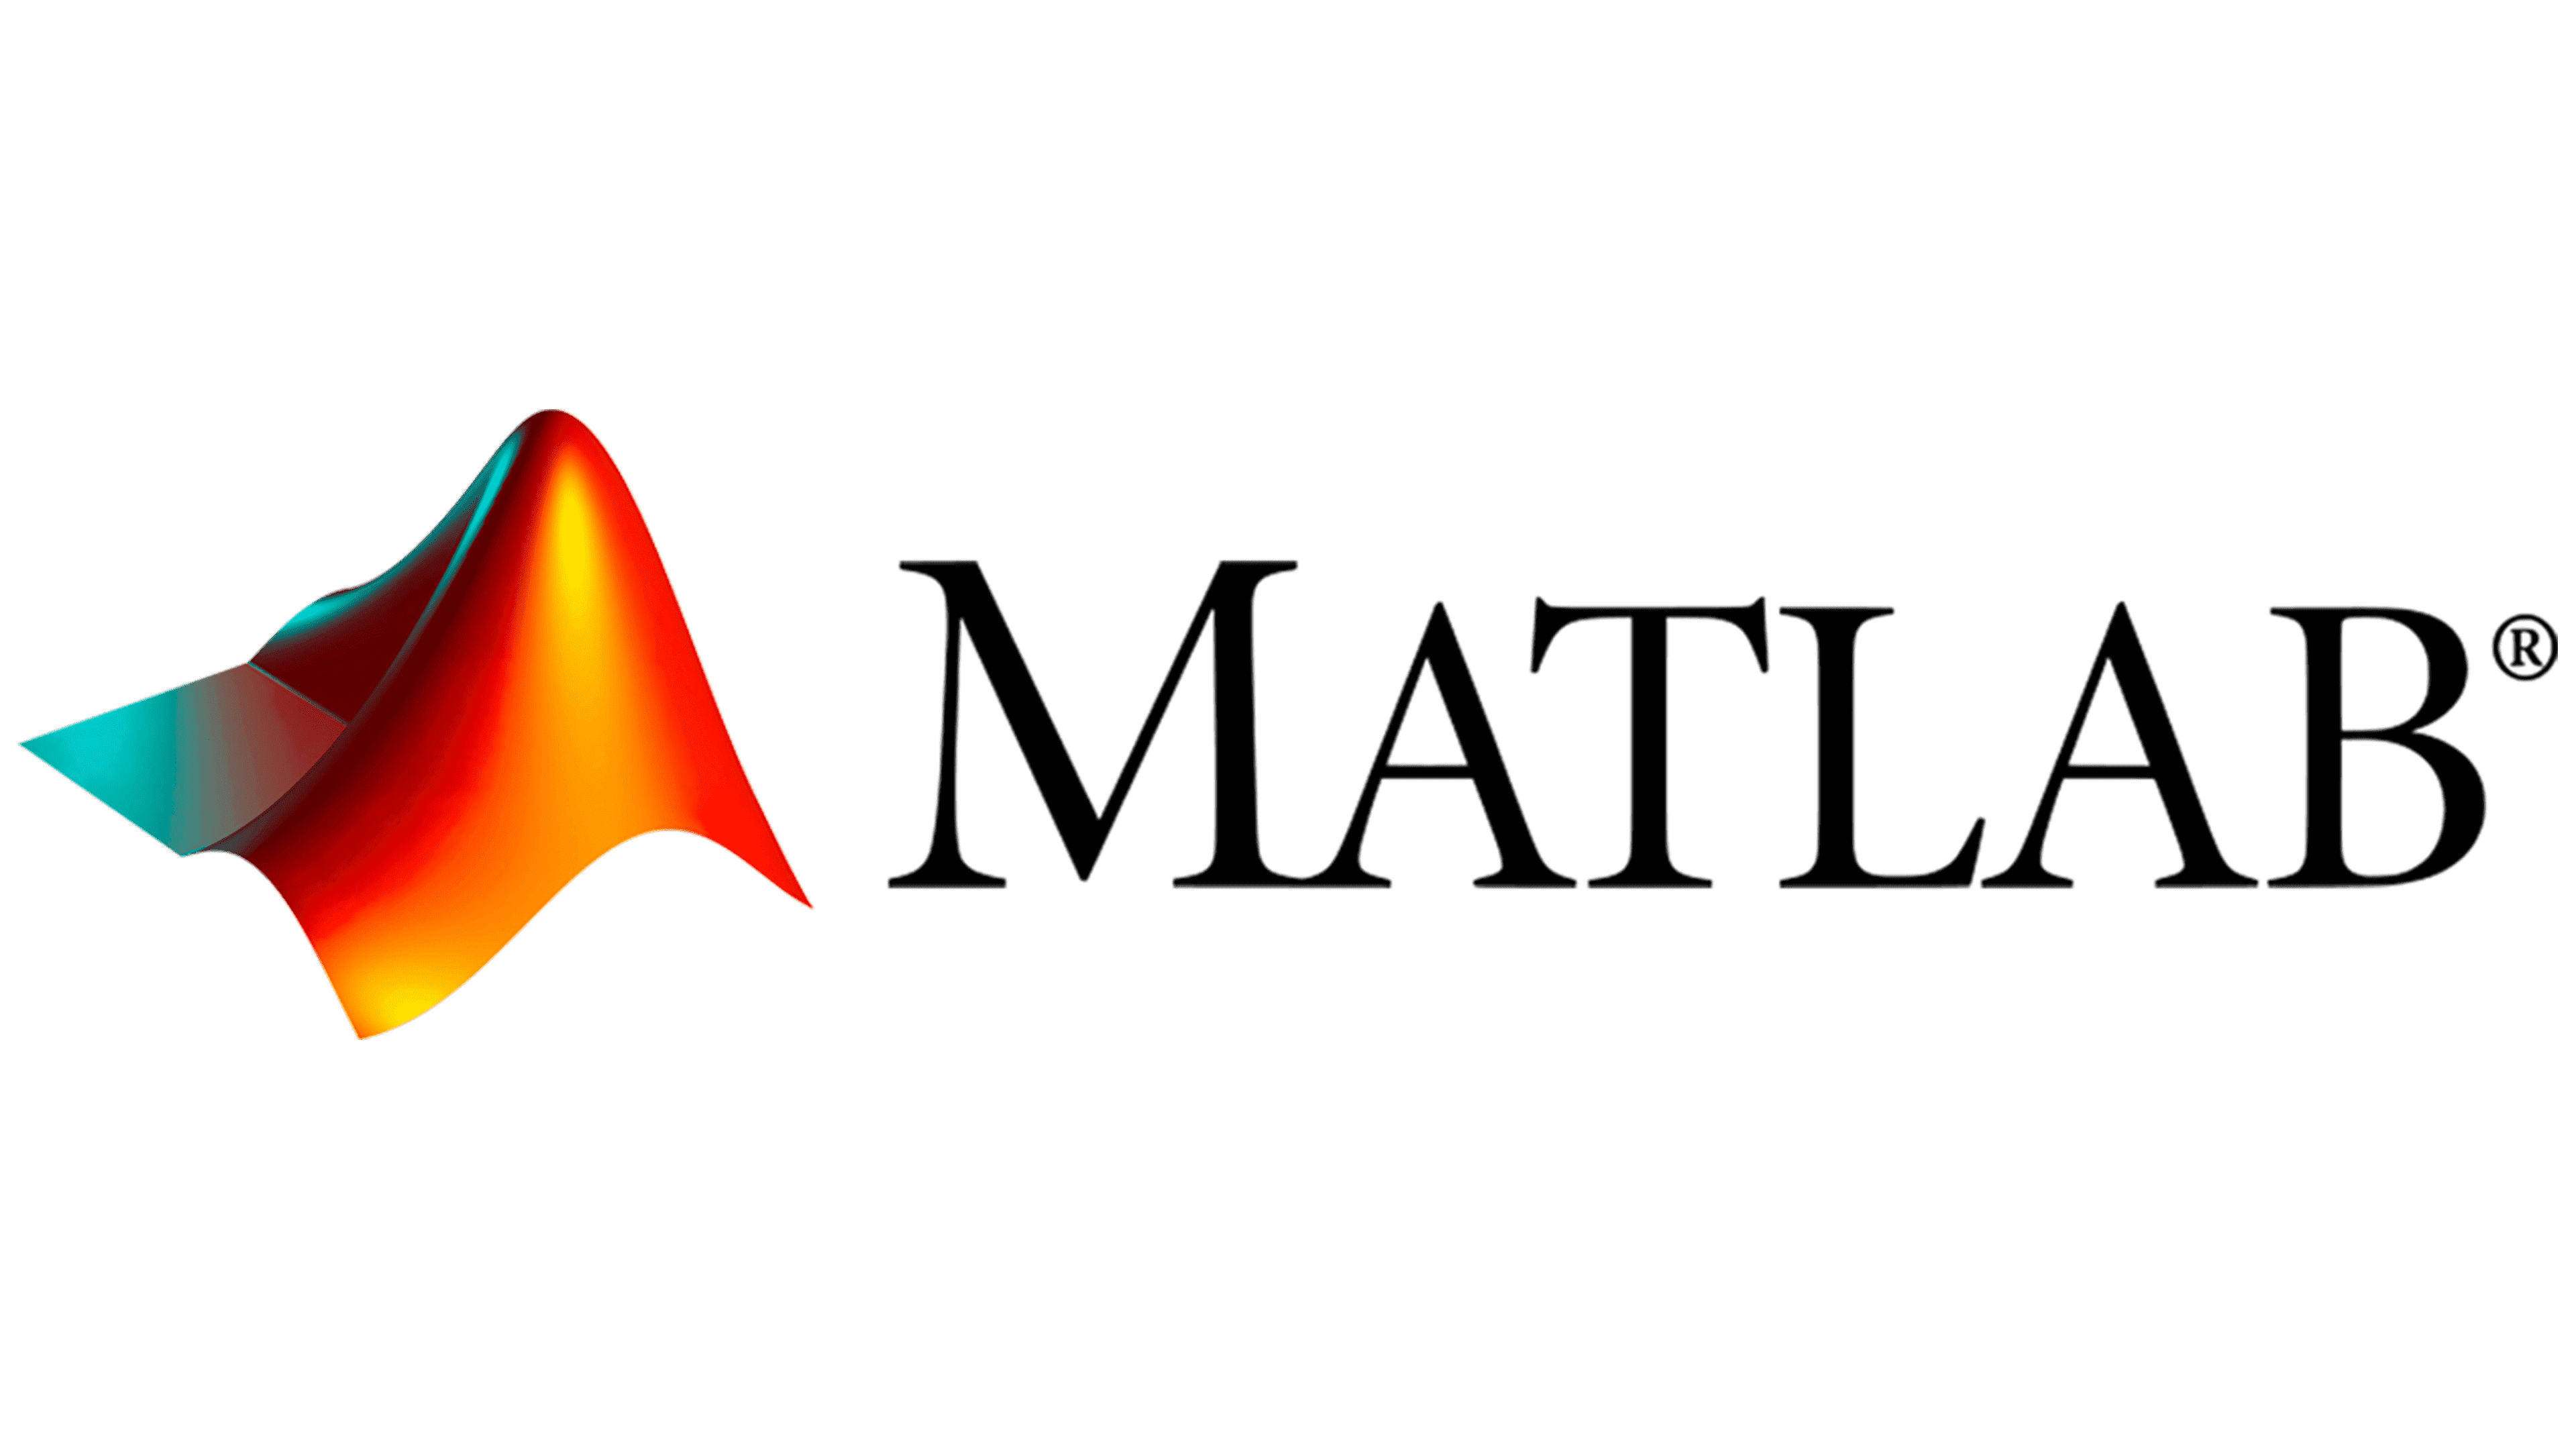 MATLAB-Emblem